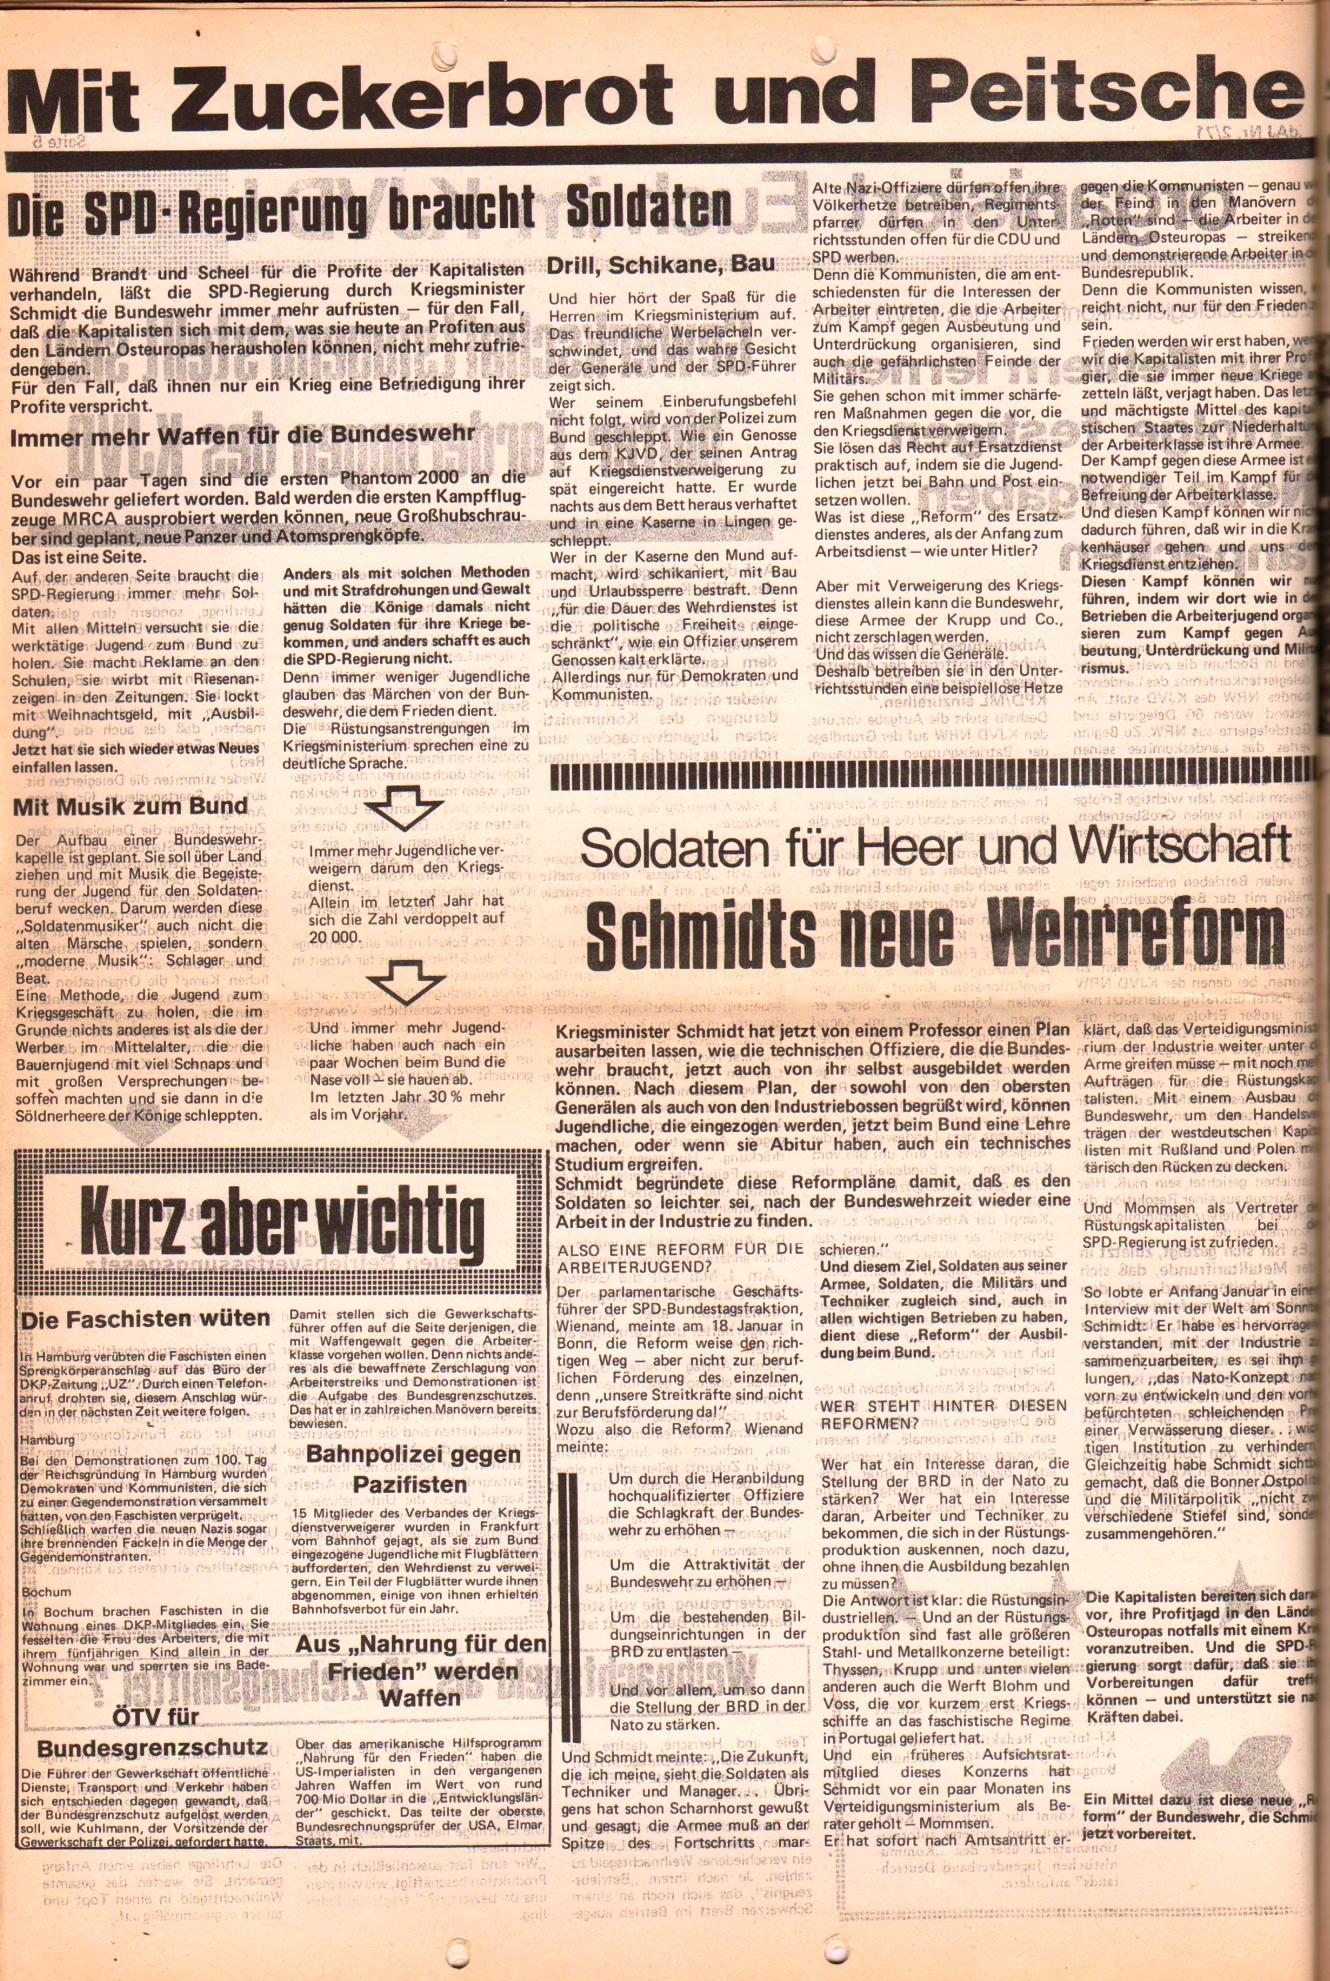 KDAJ, 2. Jg., Februar 1971, Nr. 2, Seite 6